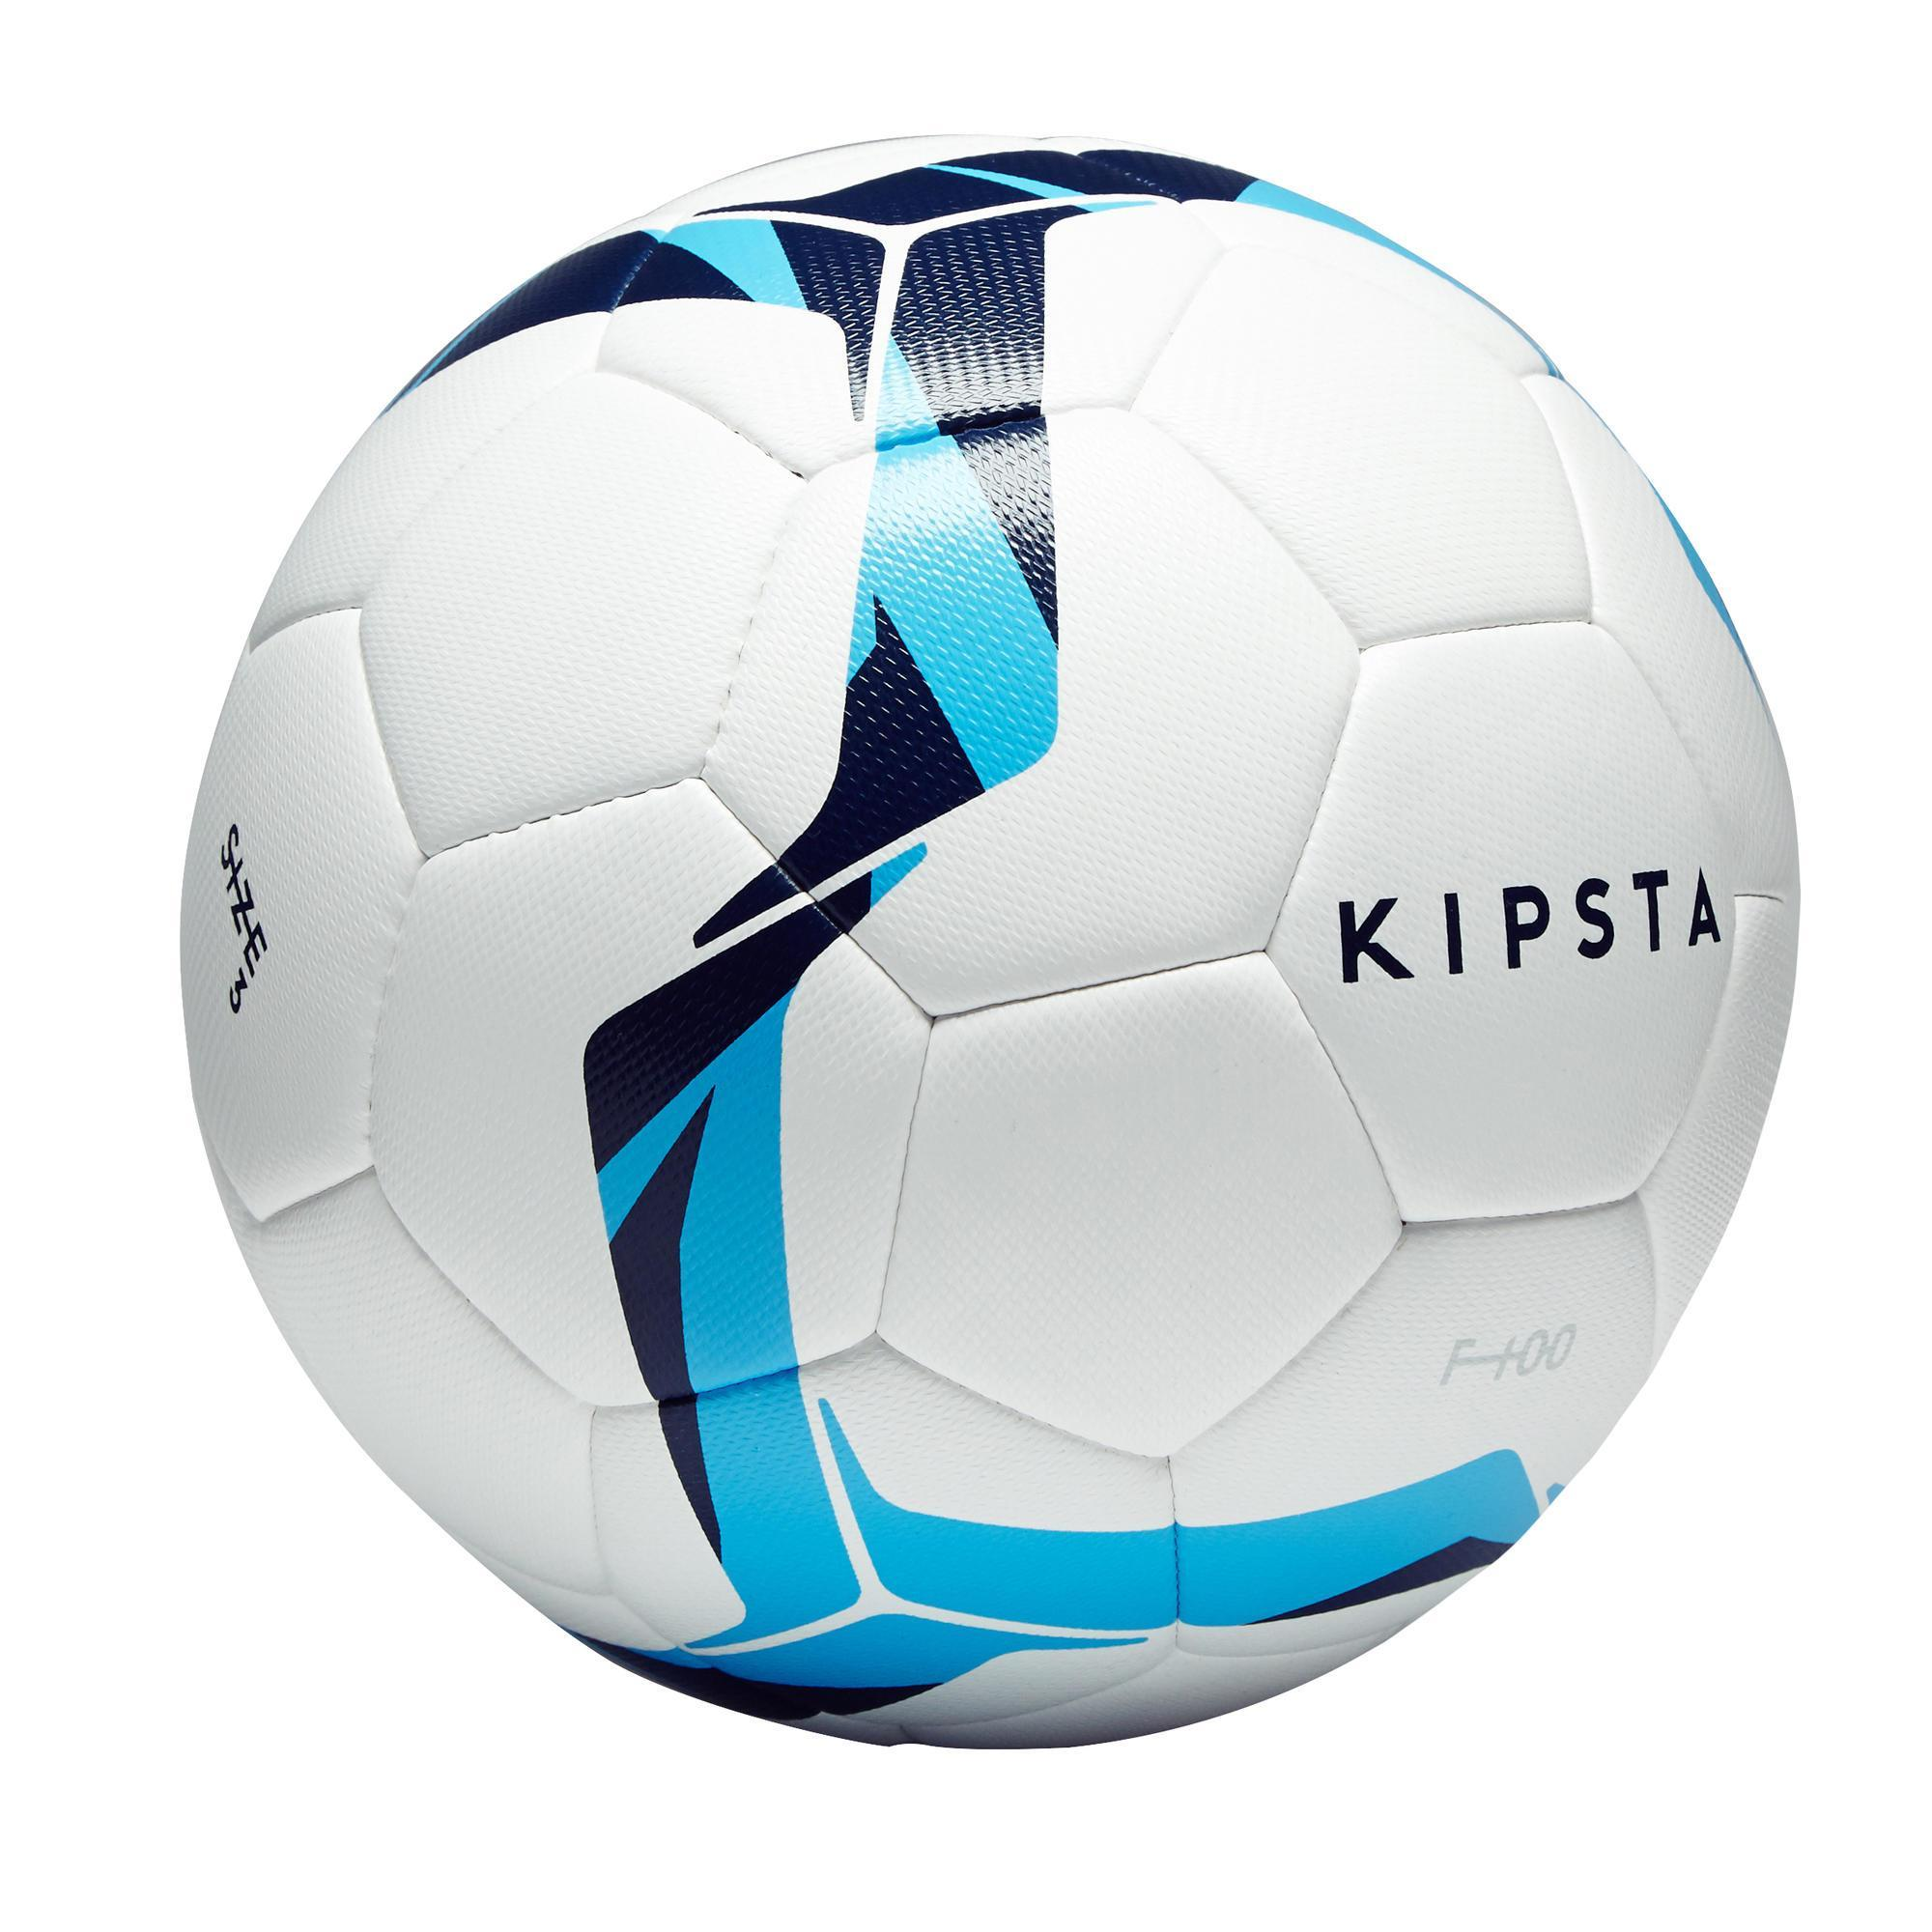 kipsta ballon de football f100 hybride taille 3 decathlon. Black Bedroom Furniture Sets. Home Design Ideas